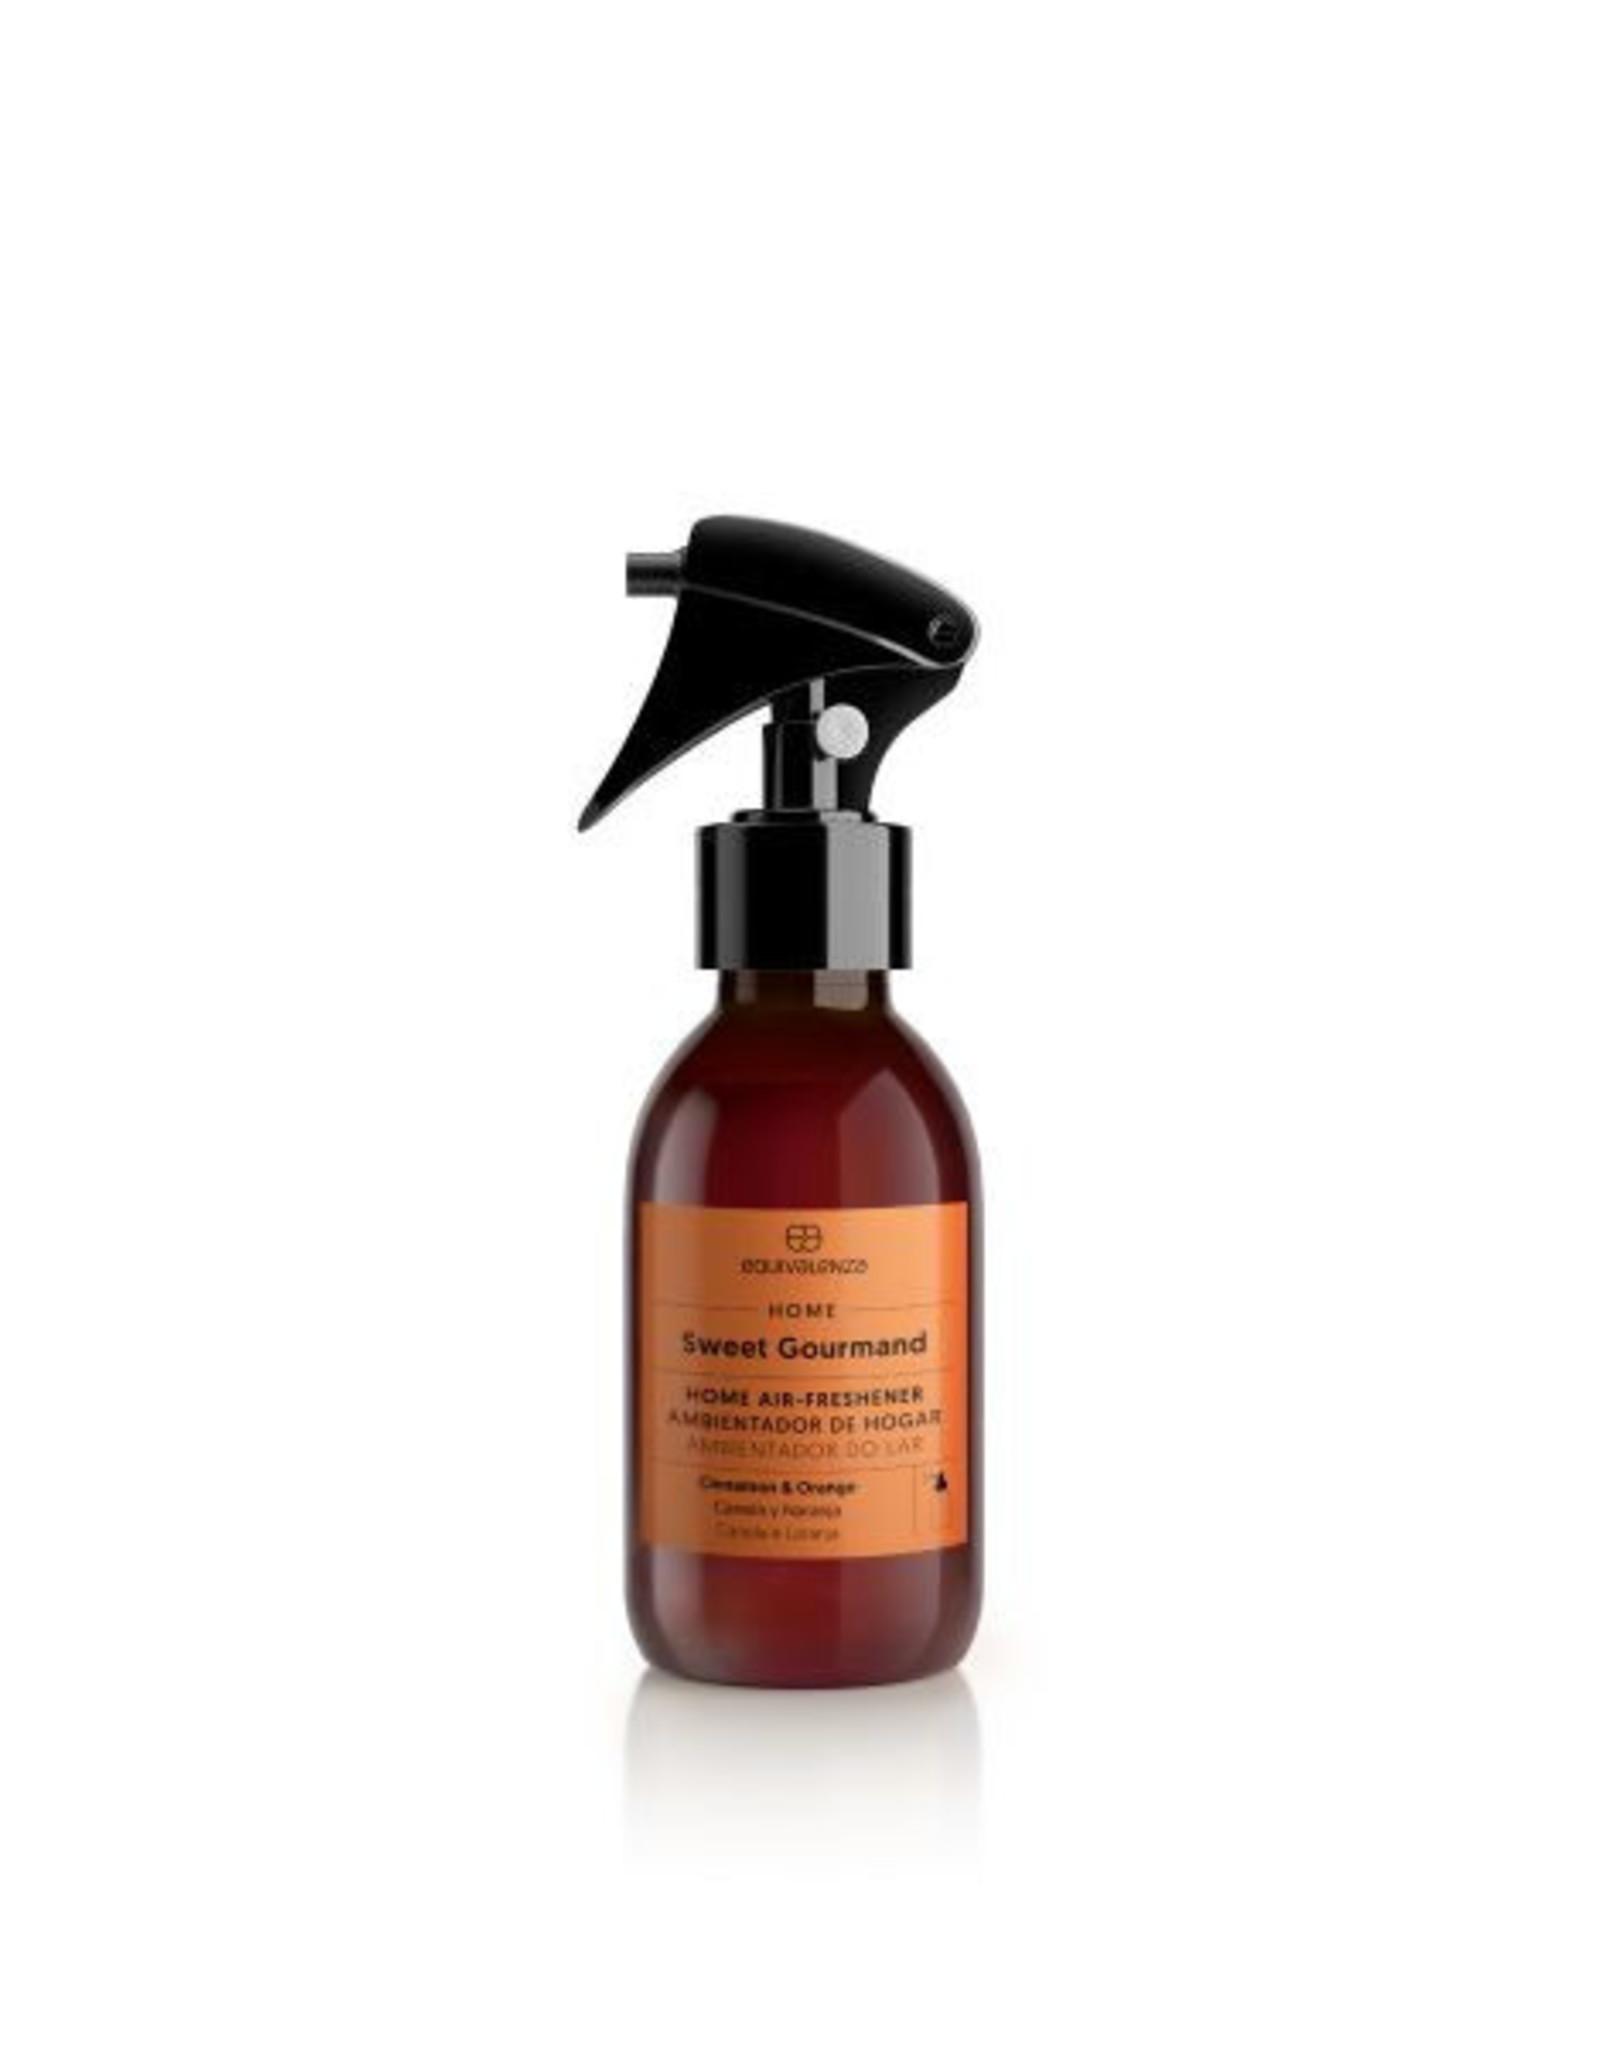 Equivalenza Air Freshener - Sweet Gourmand (orange and cinnamon)